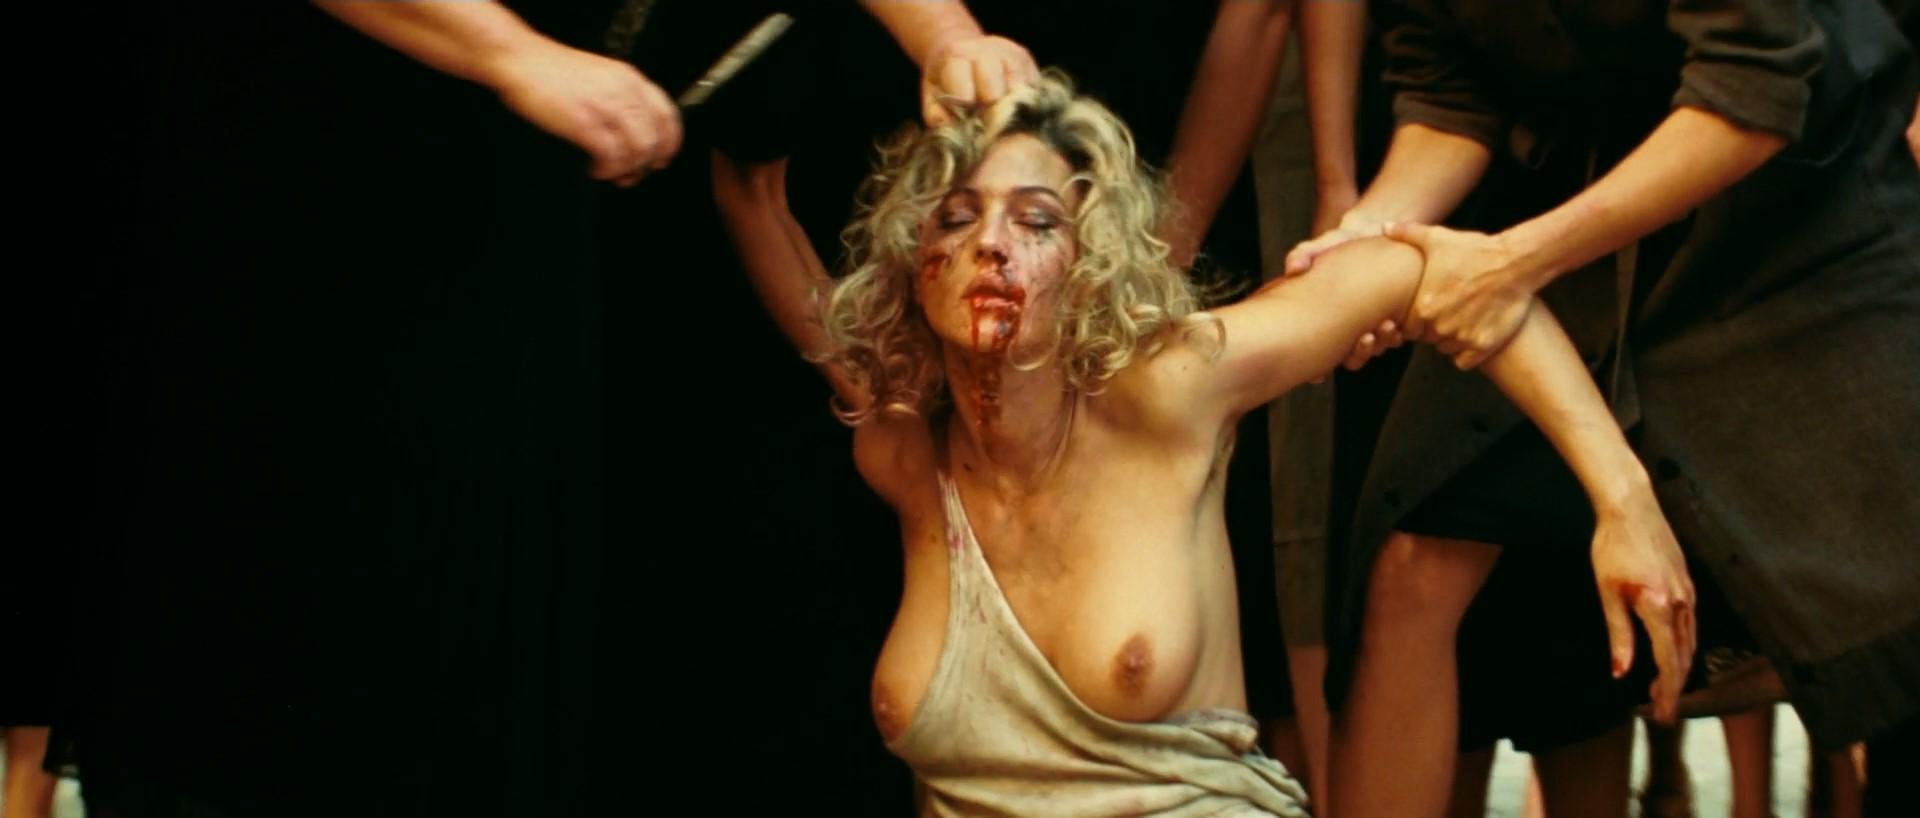 Ana Claudia Desnuda claudia black nude pics - megapornx